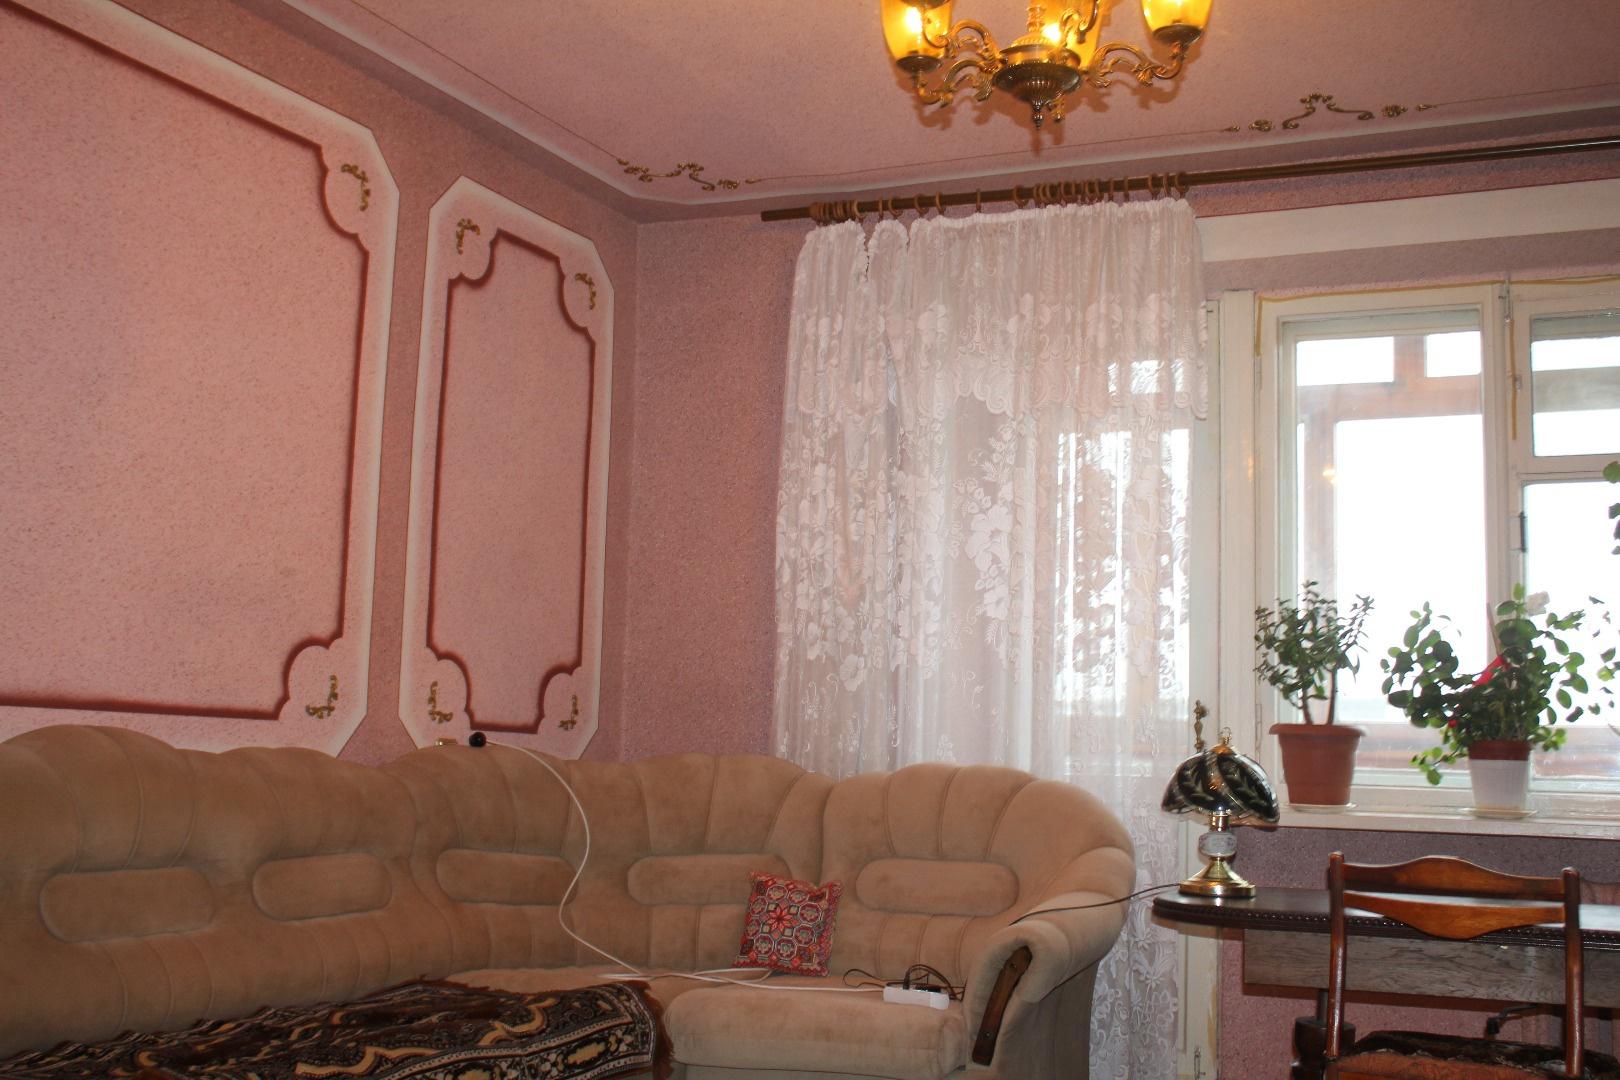 Продается 4-комнатная Квартира на ул. Спортивная (Гайдара) — 53 000 у.е. (фото №5)